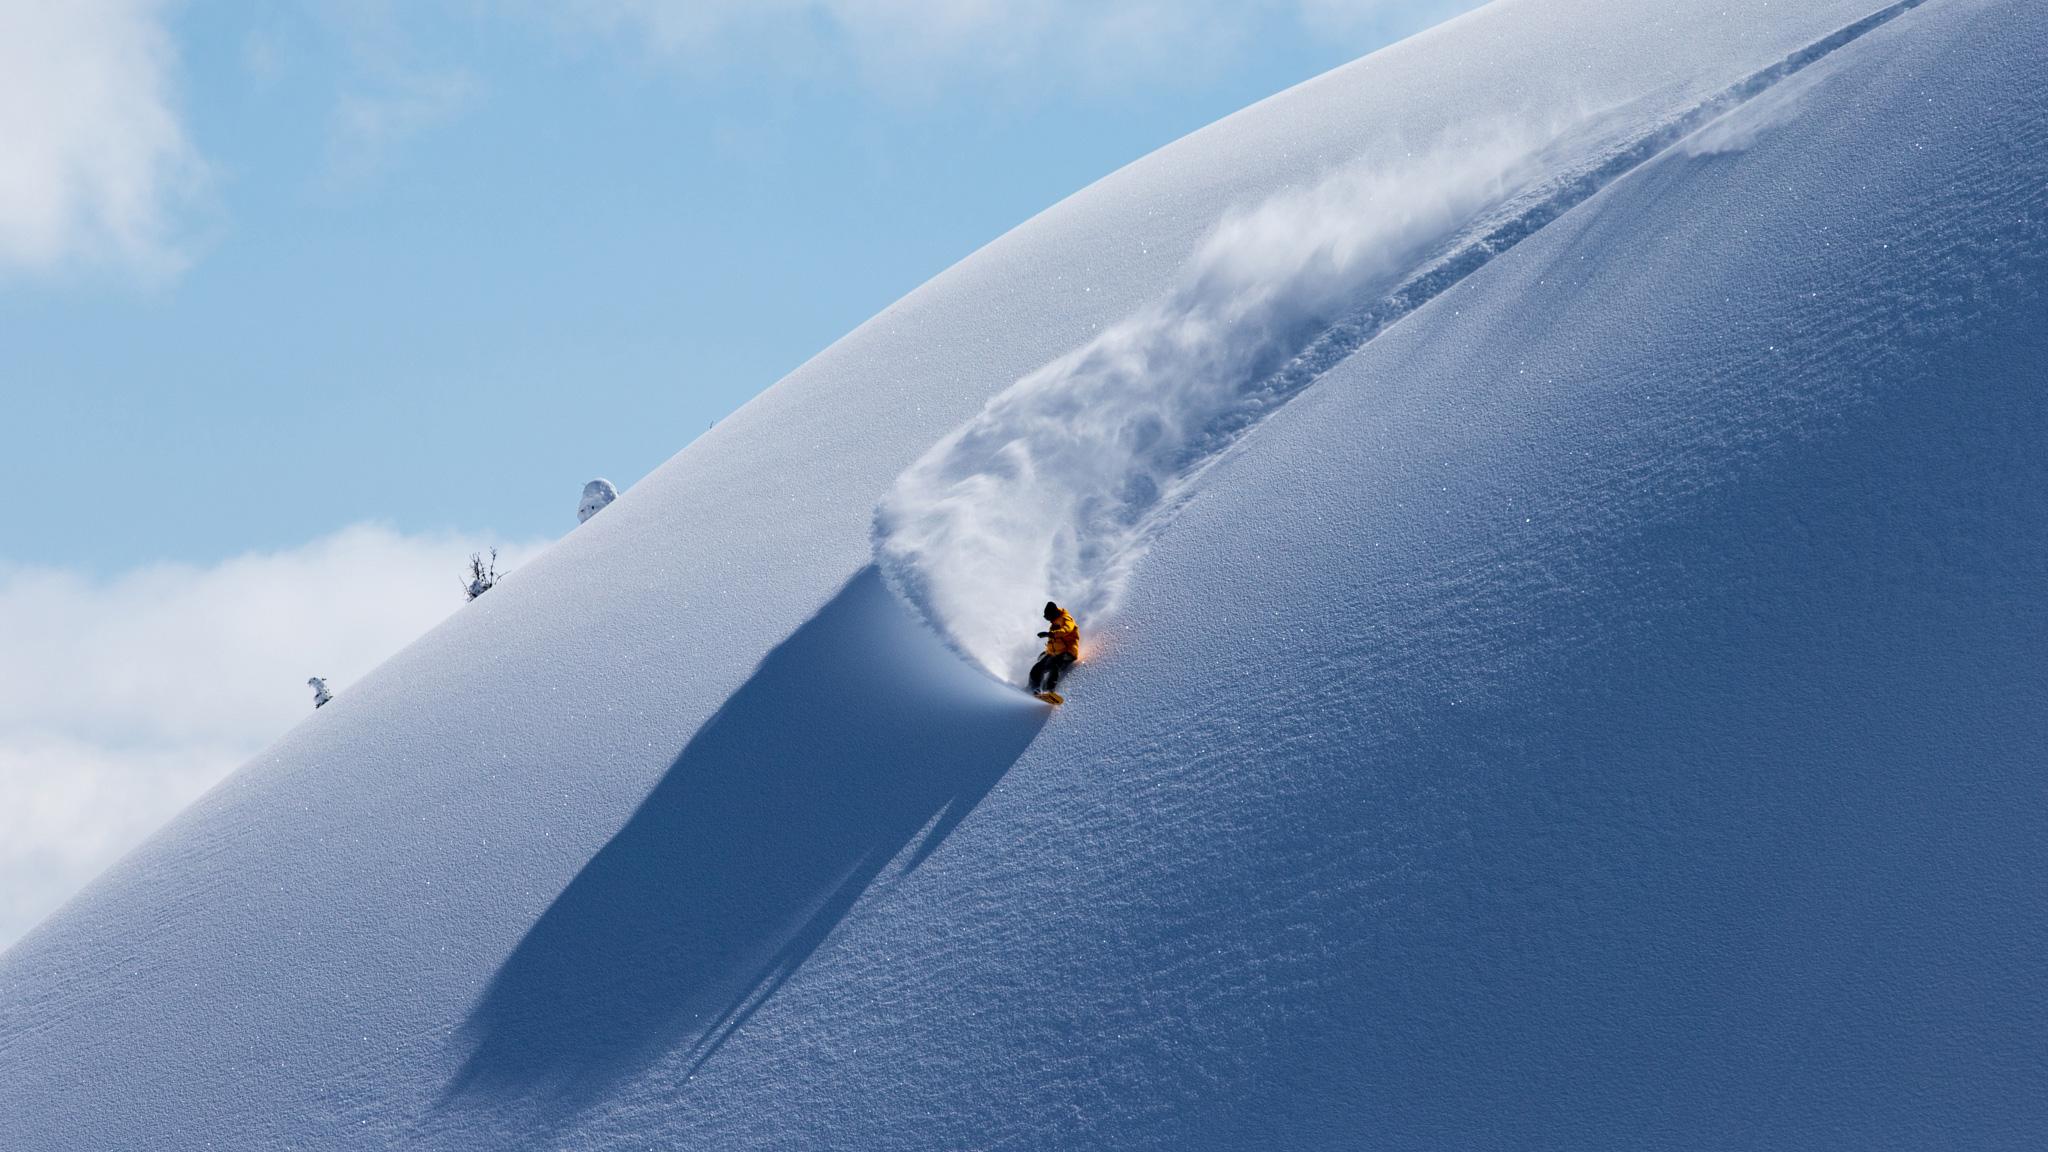 oakley snowboarding prj3  Jake Blauvelt